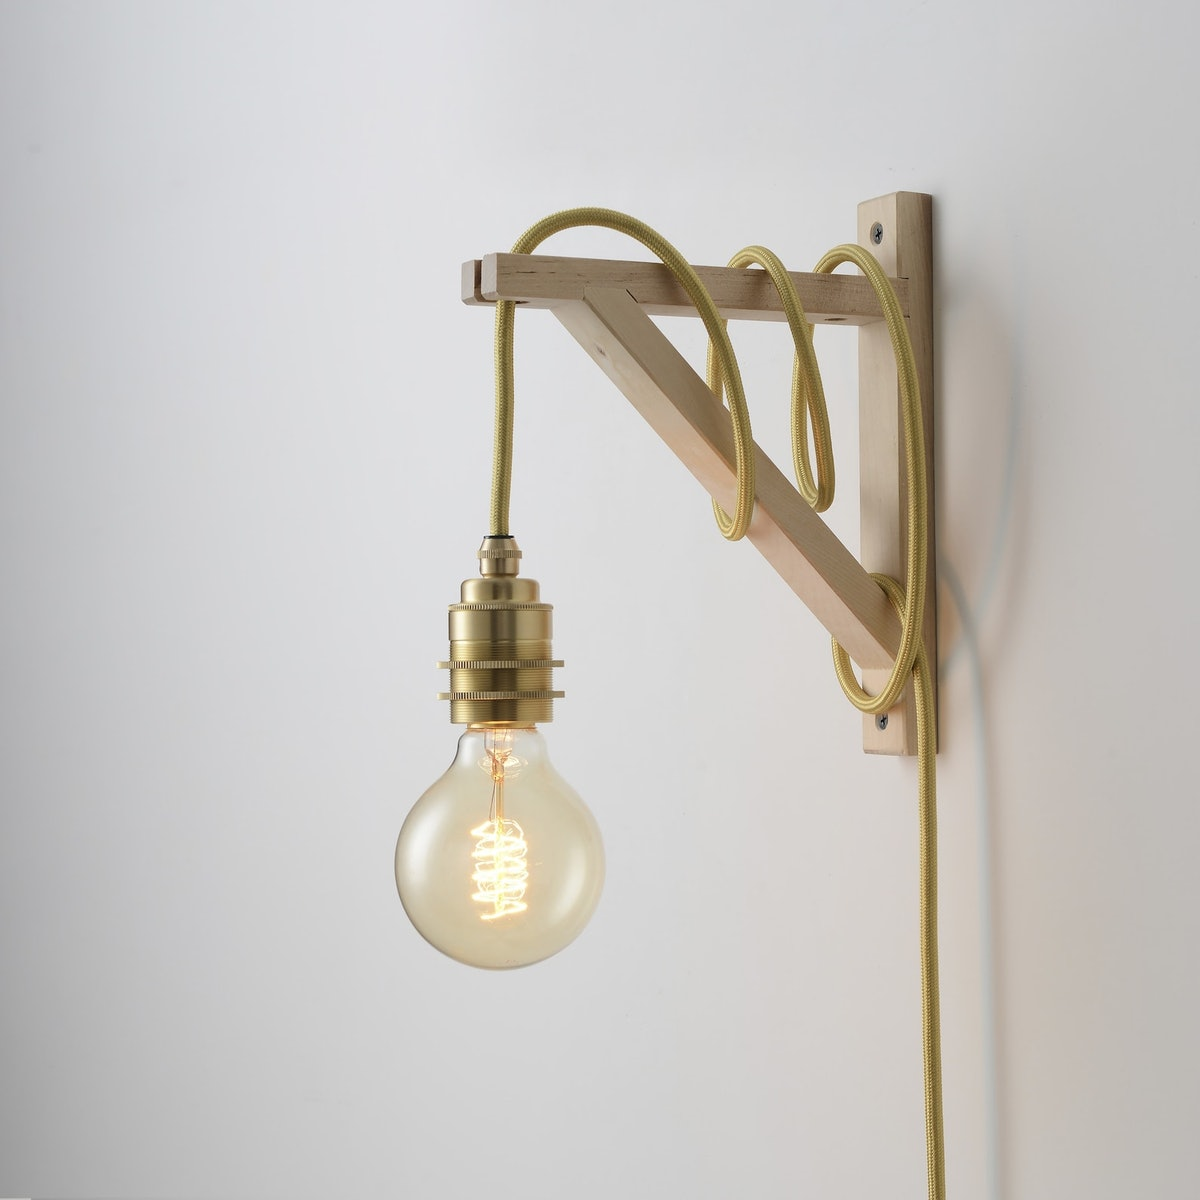 Brass Plug-In Pendant Light